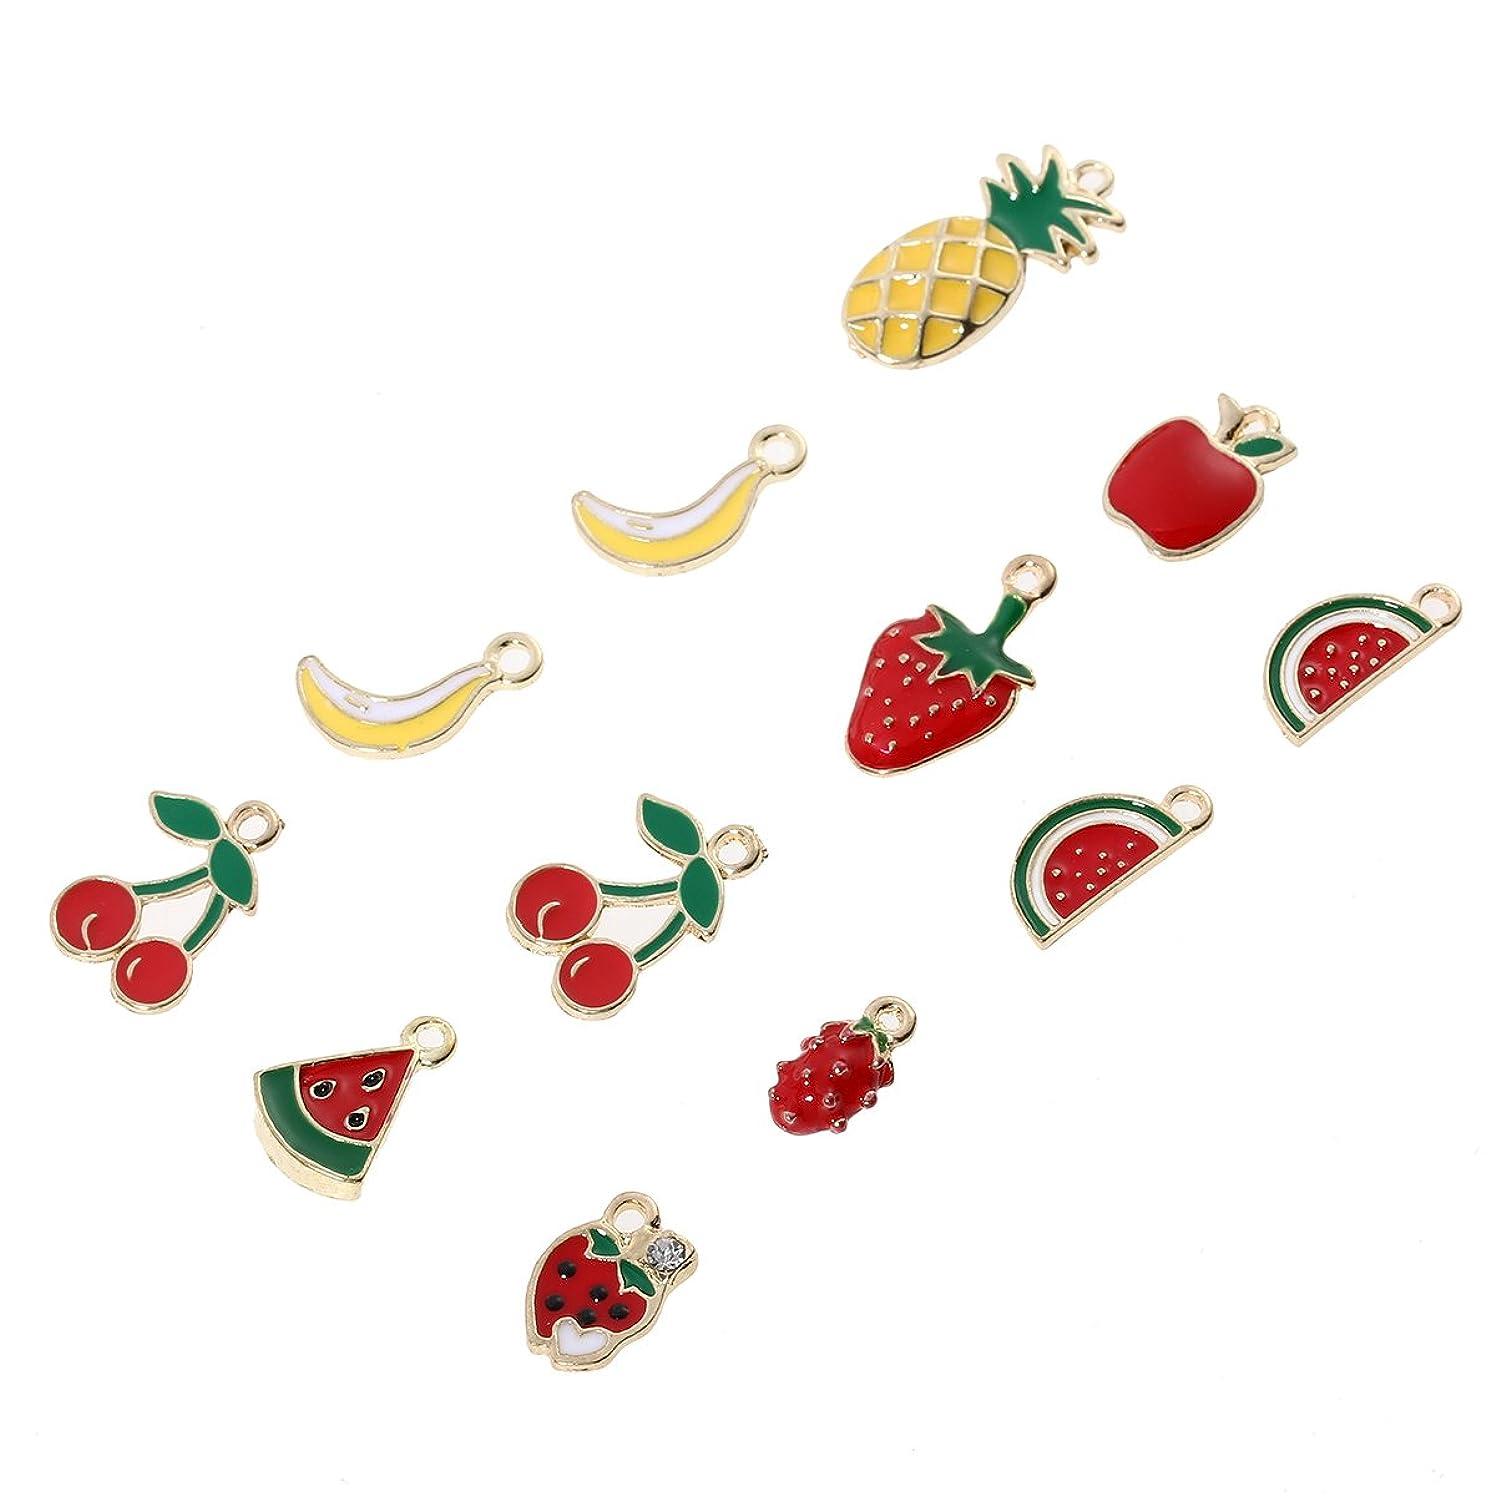 LUOEM 12pcs Cute Fruit Charms Pendant Mixed Gold Enamel Pendants for Jewelry DIY Making